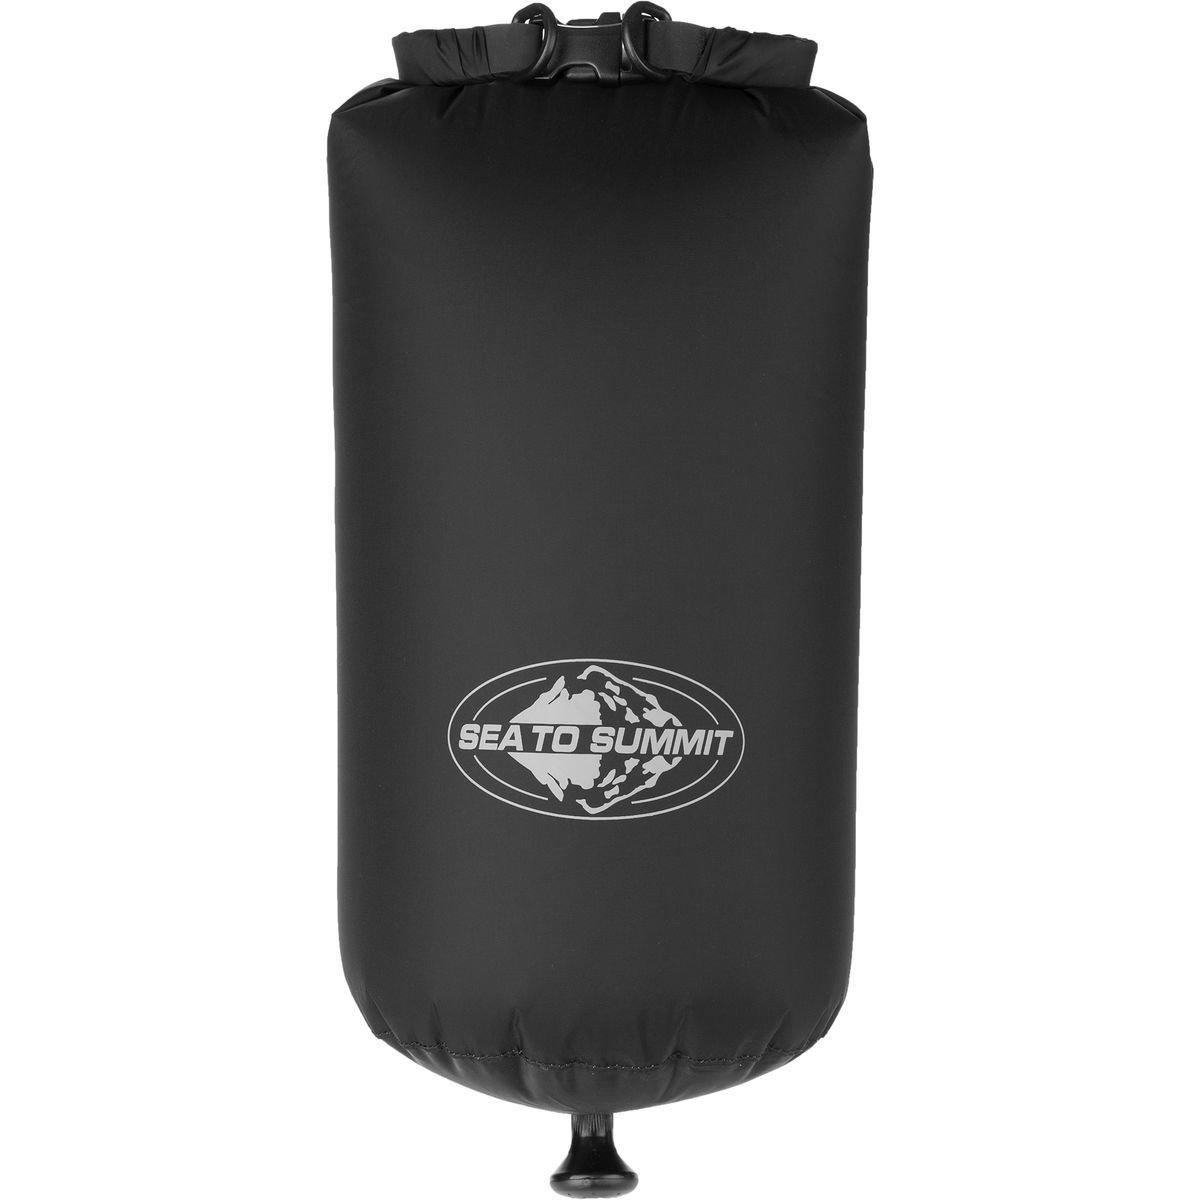 Portable Camp Shower Bag - Sea to Summit Pocket Shower or similar